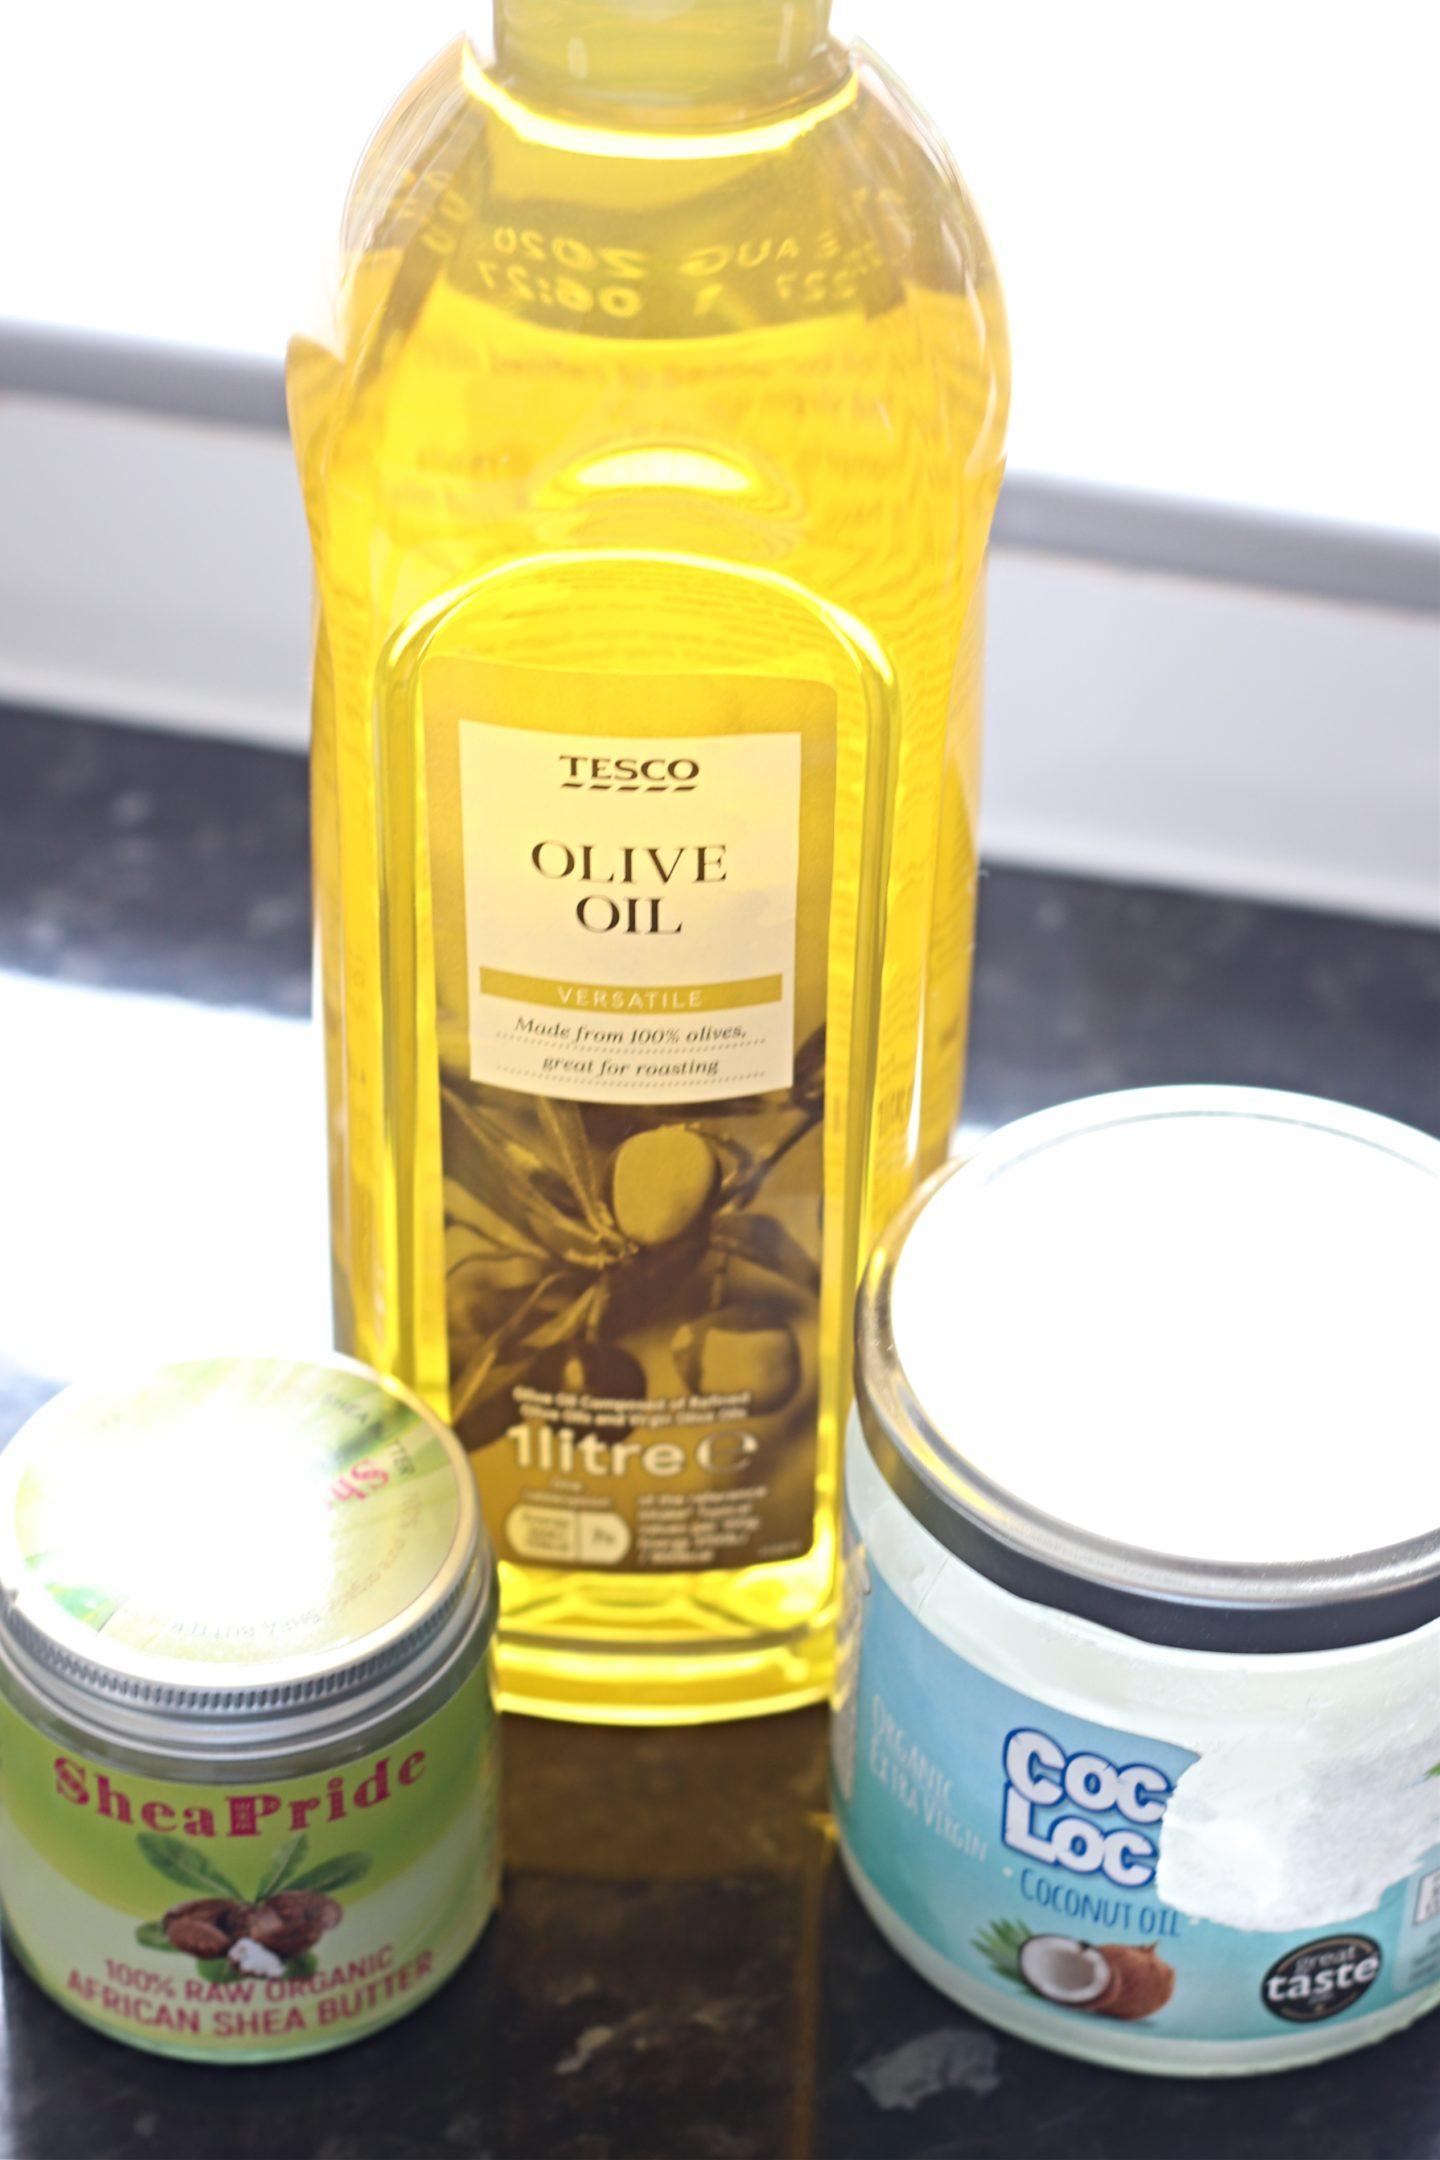 Homemade face creams - Makes, Bakes and